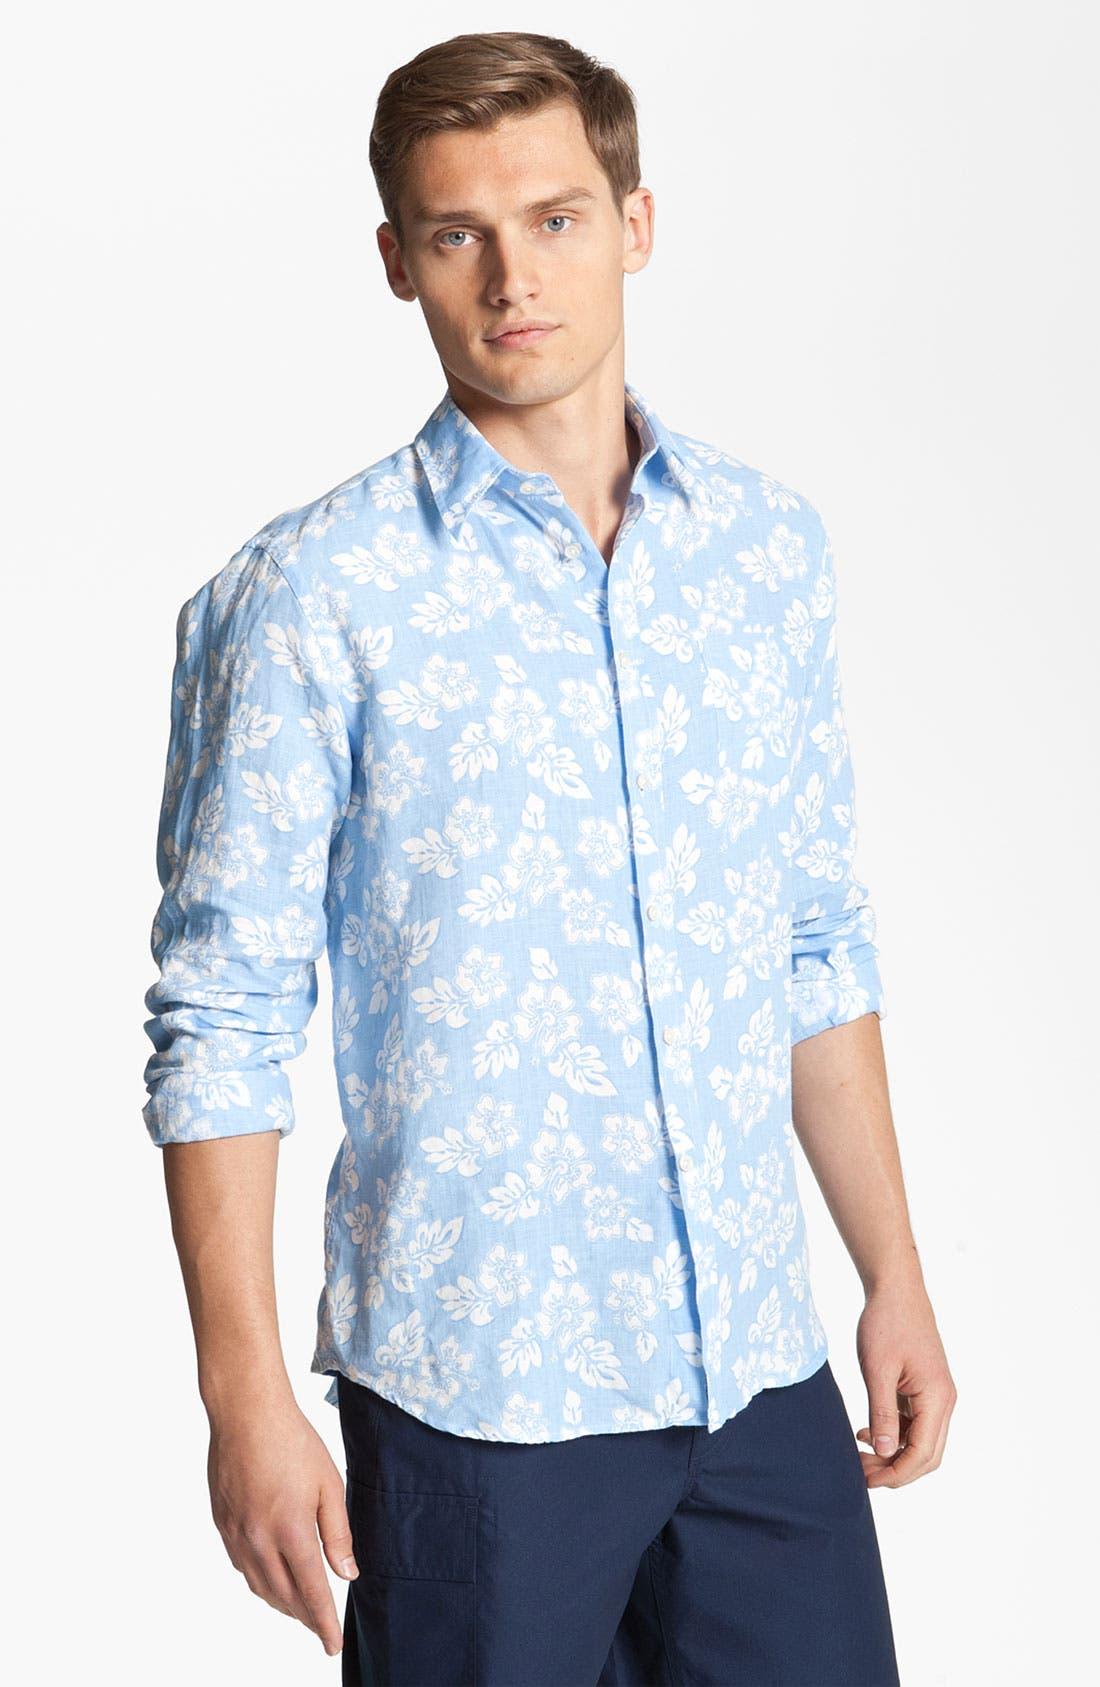 Alternate Image 1 Selected - Vilebrequin Print Linen Shirt